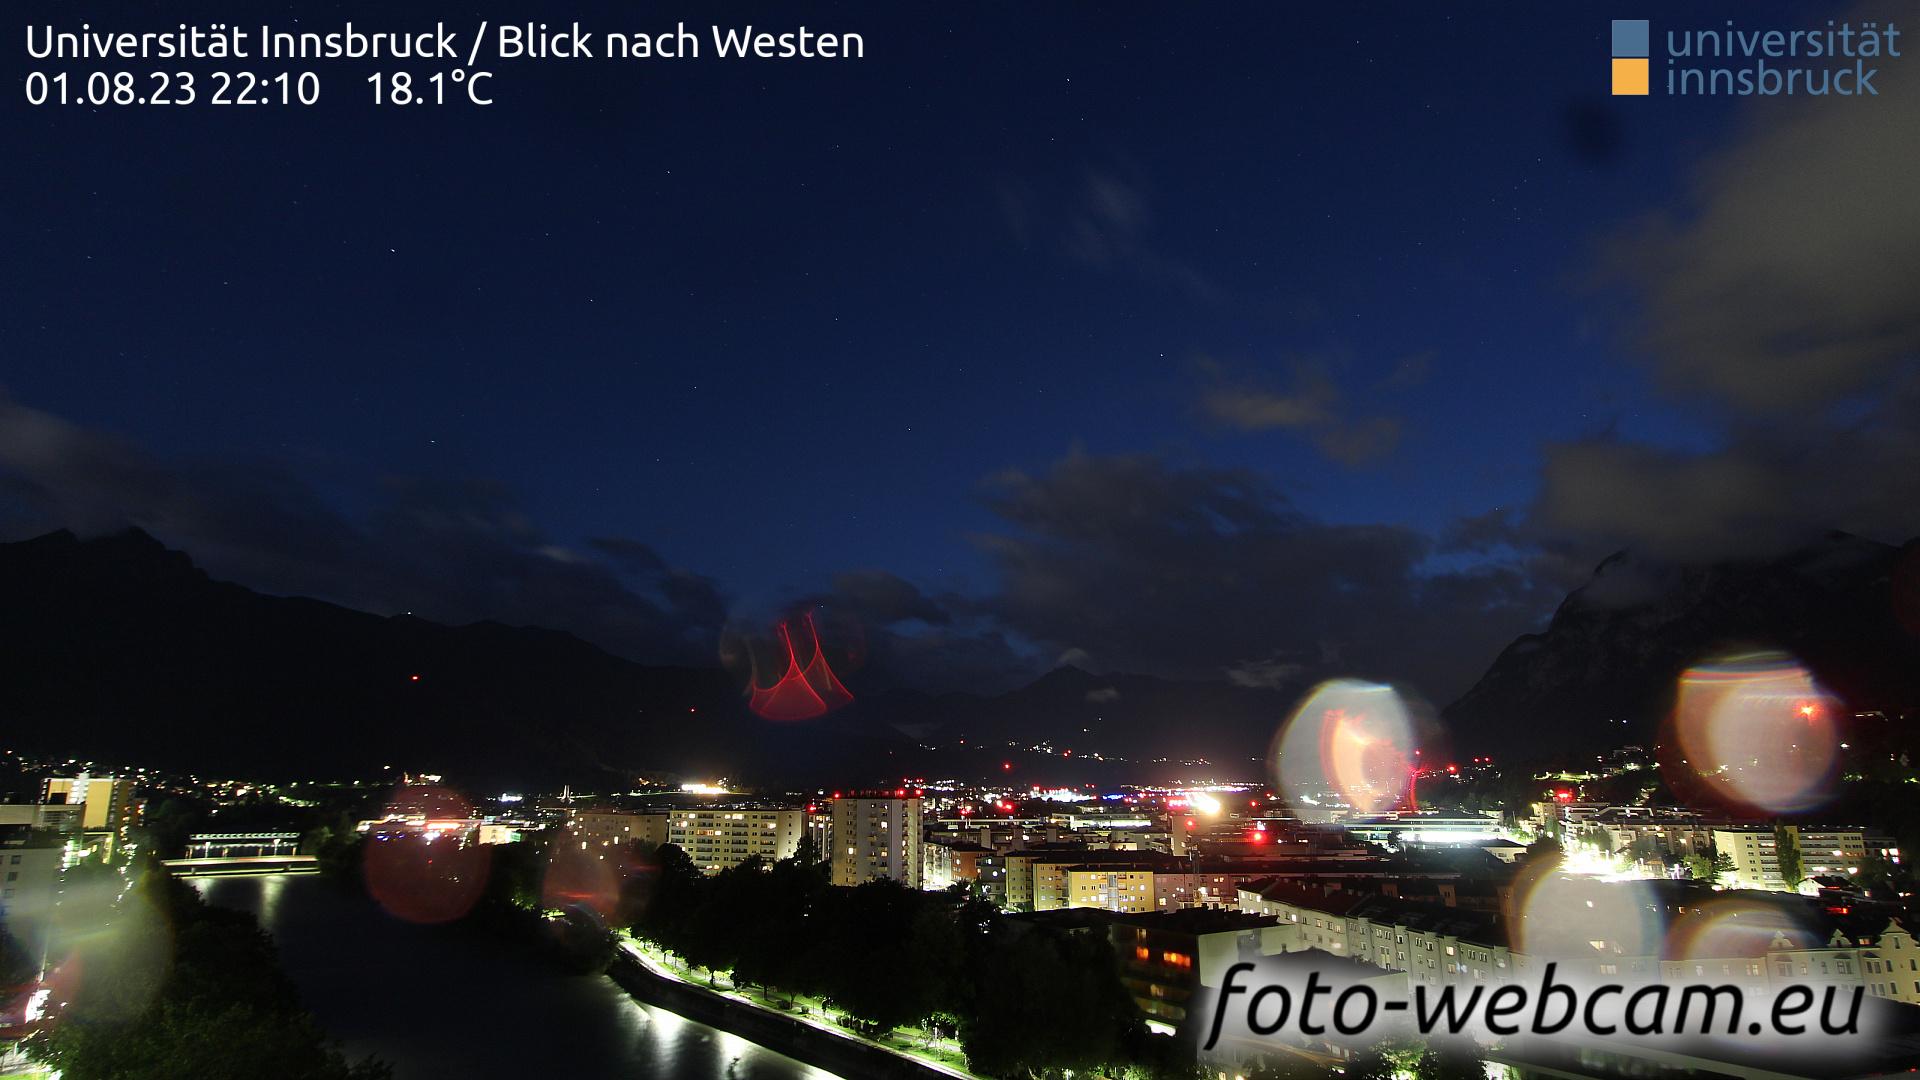 Innsbruck Sun. 22:25